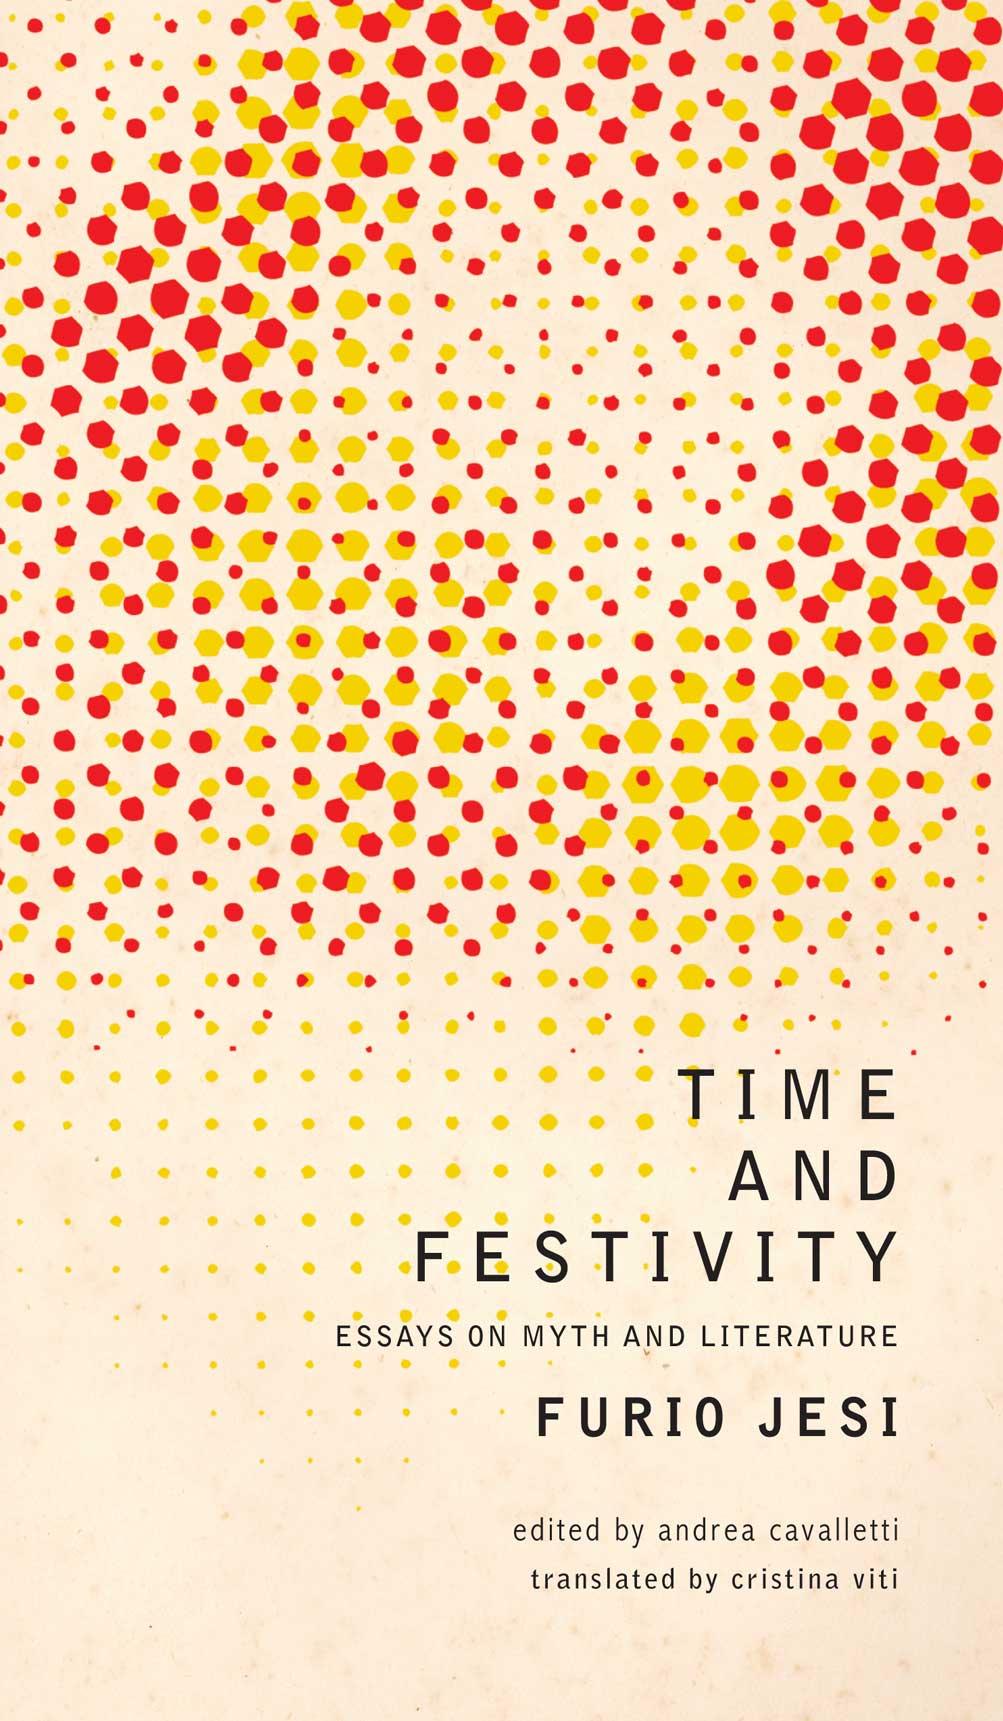 Time and Festivity by Furio Jesi |  Seagull Books